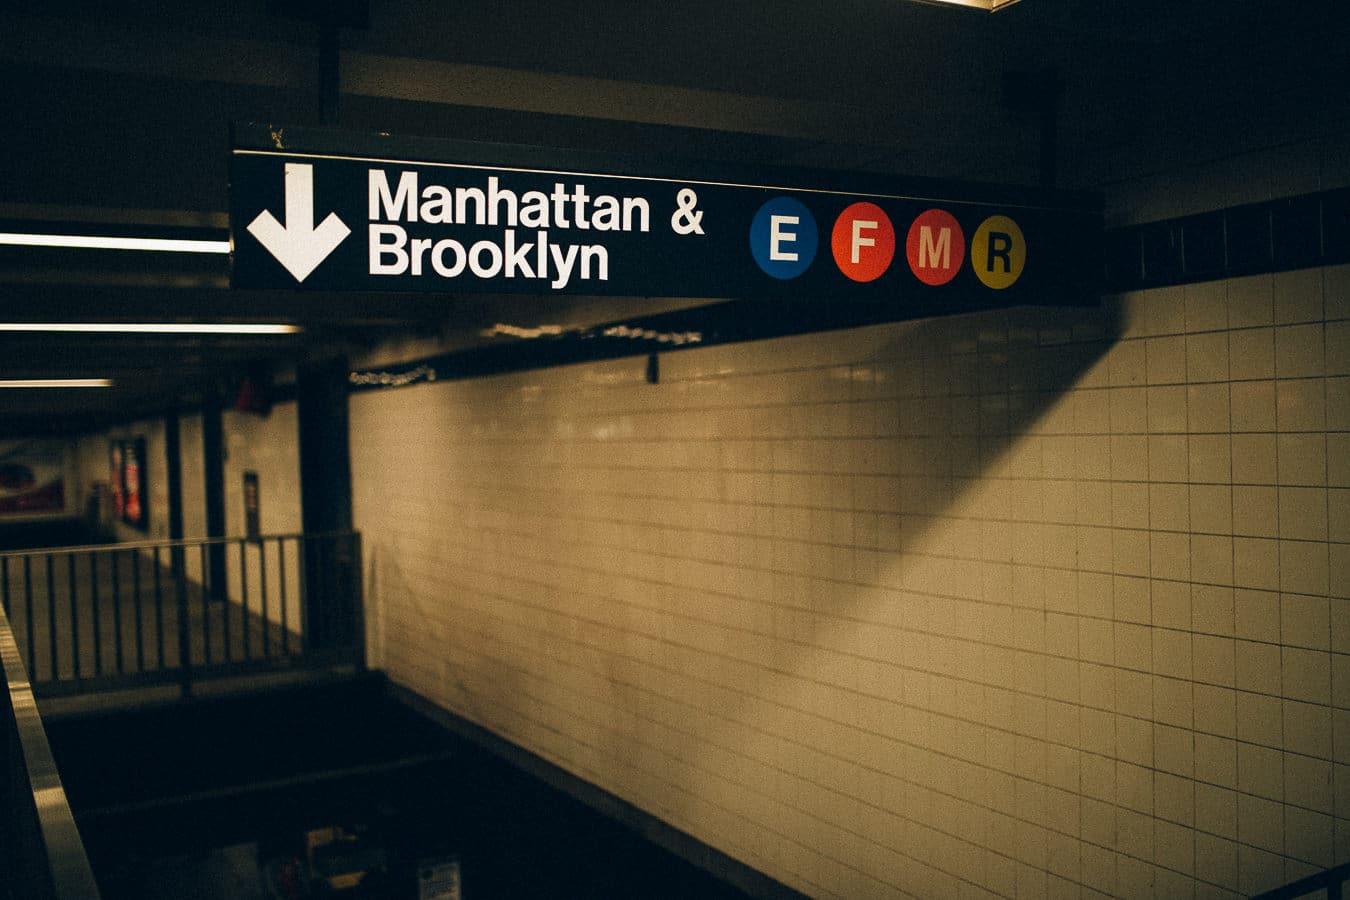 Manhattan Brooklyn New York City Subway